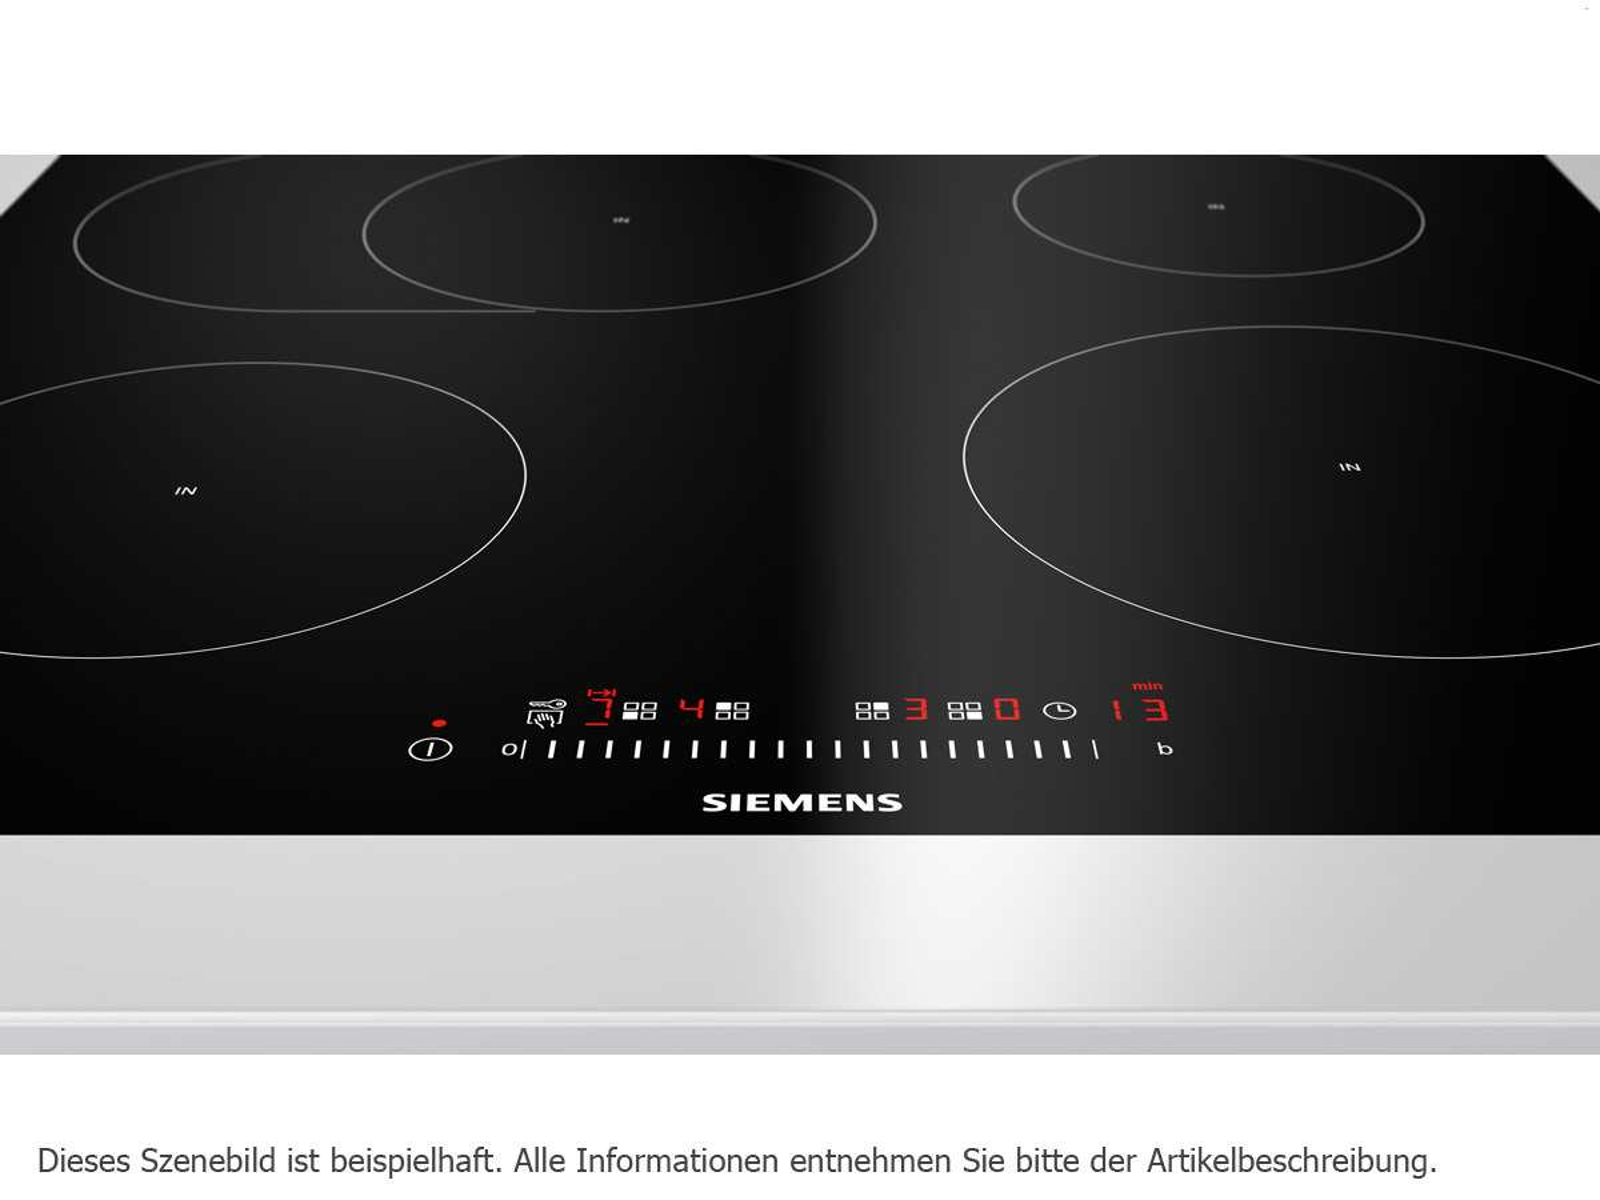 siemens eh601ffb1e induktionskochfeld autark. Black Bedroom Furniture Sets. Home Design Ideas